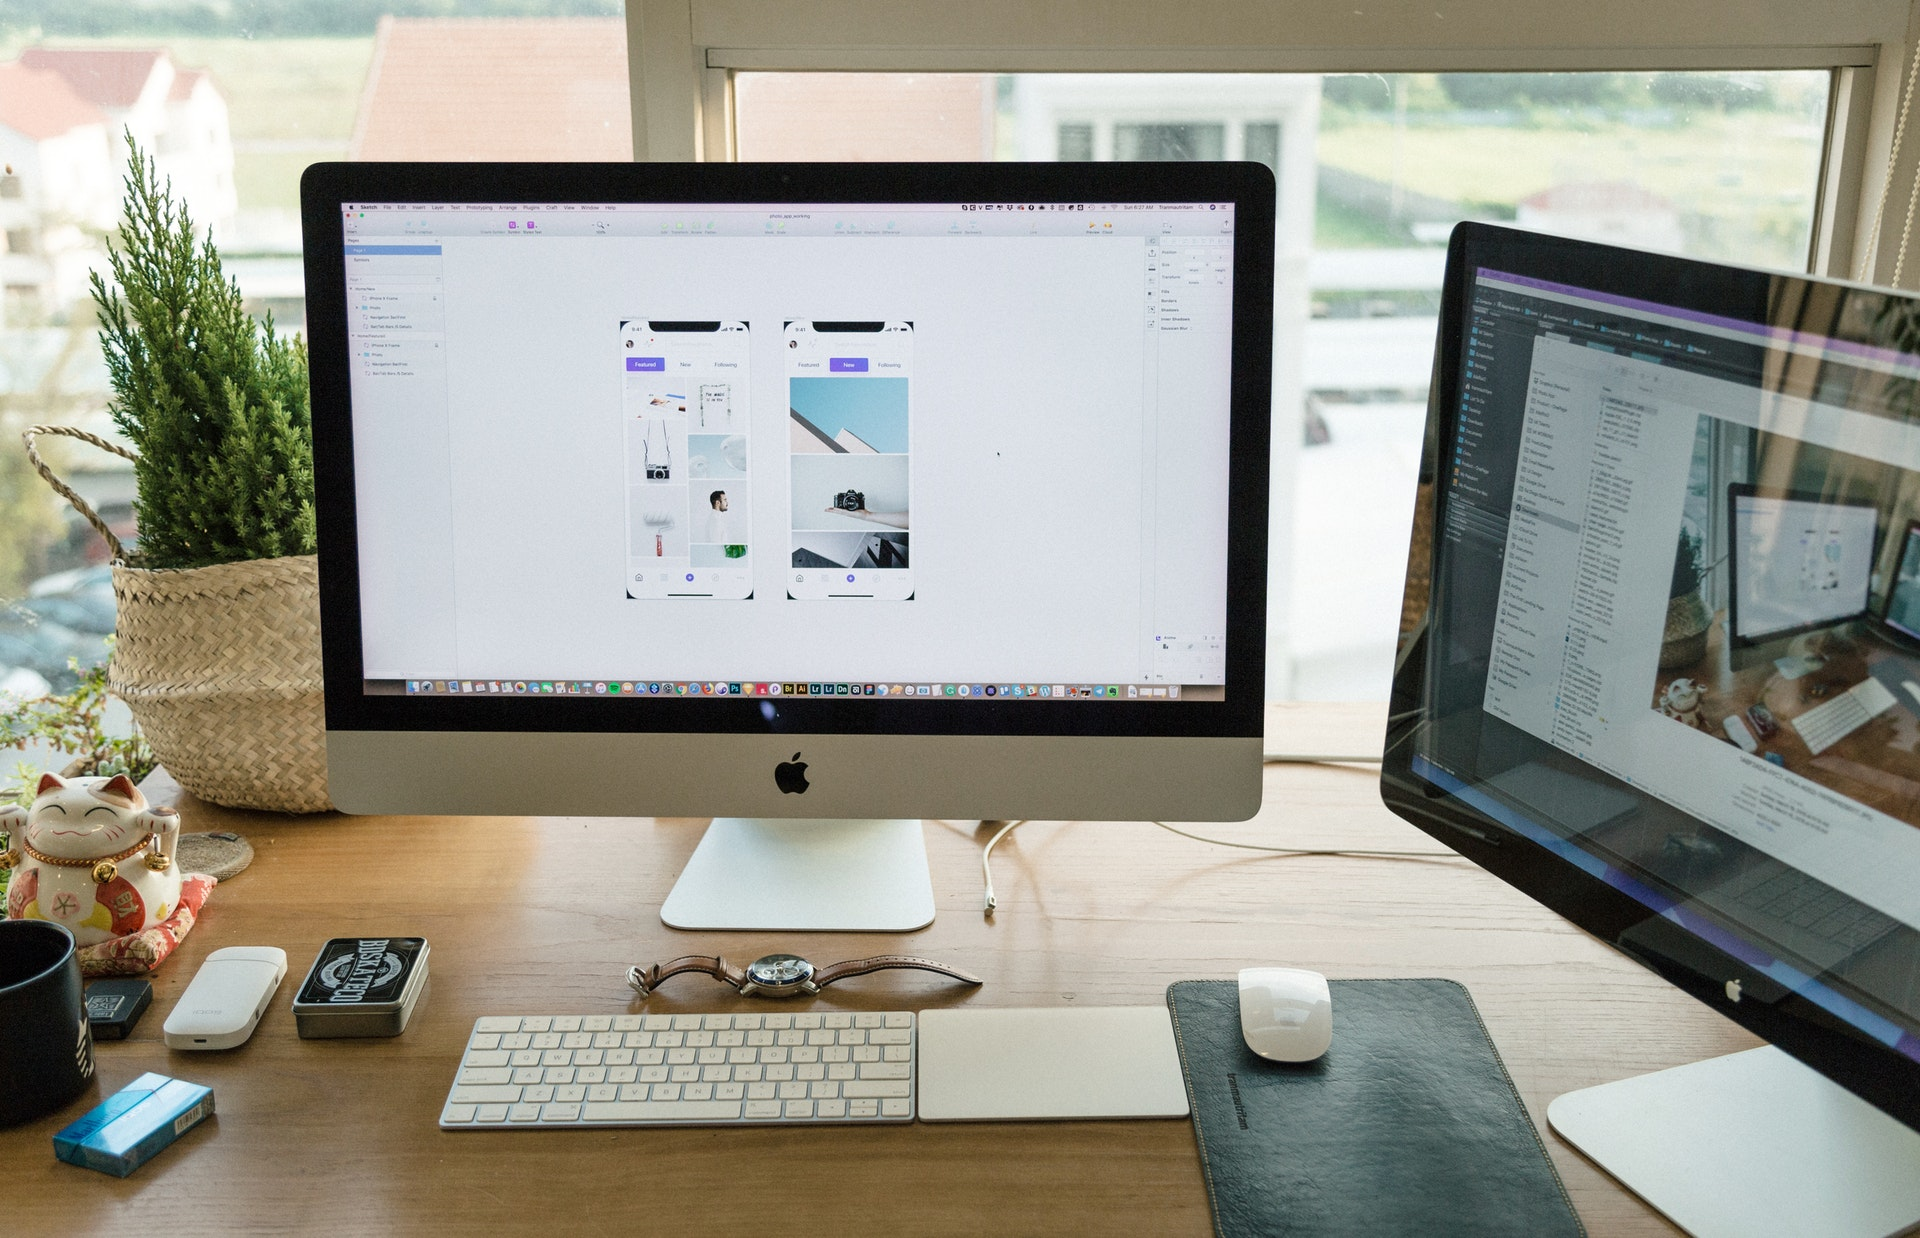 Hey, I'm Freelance Graphic Designer Extraordinaire Max Komazi